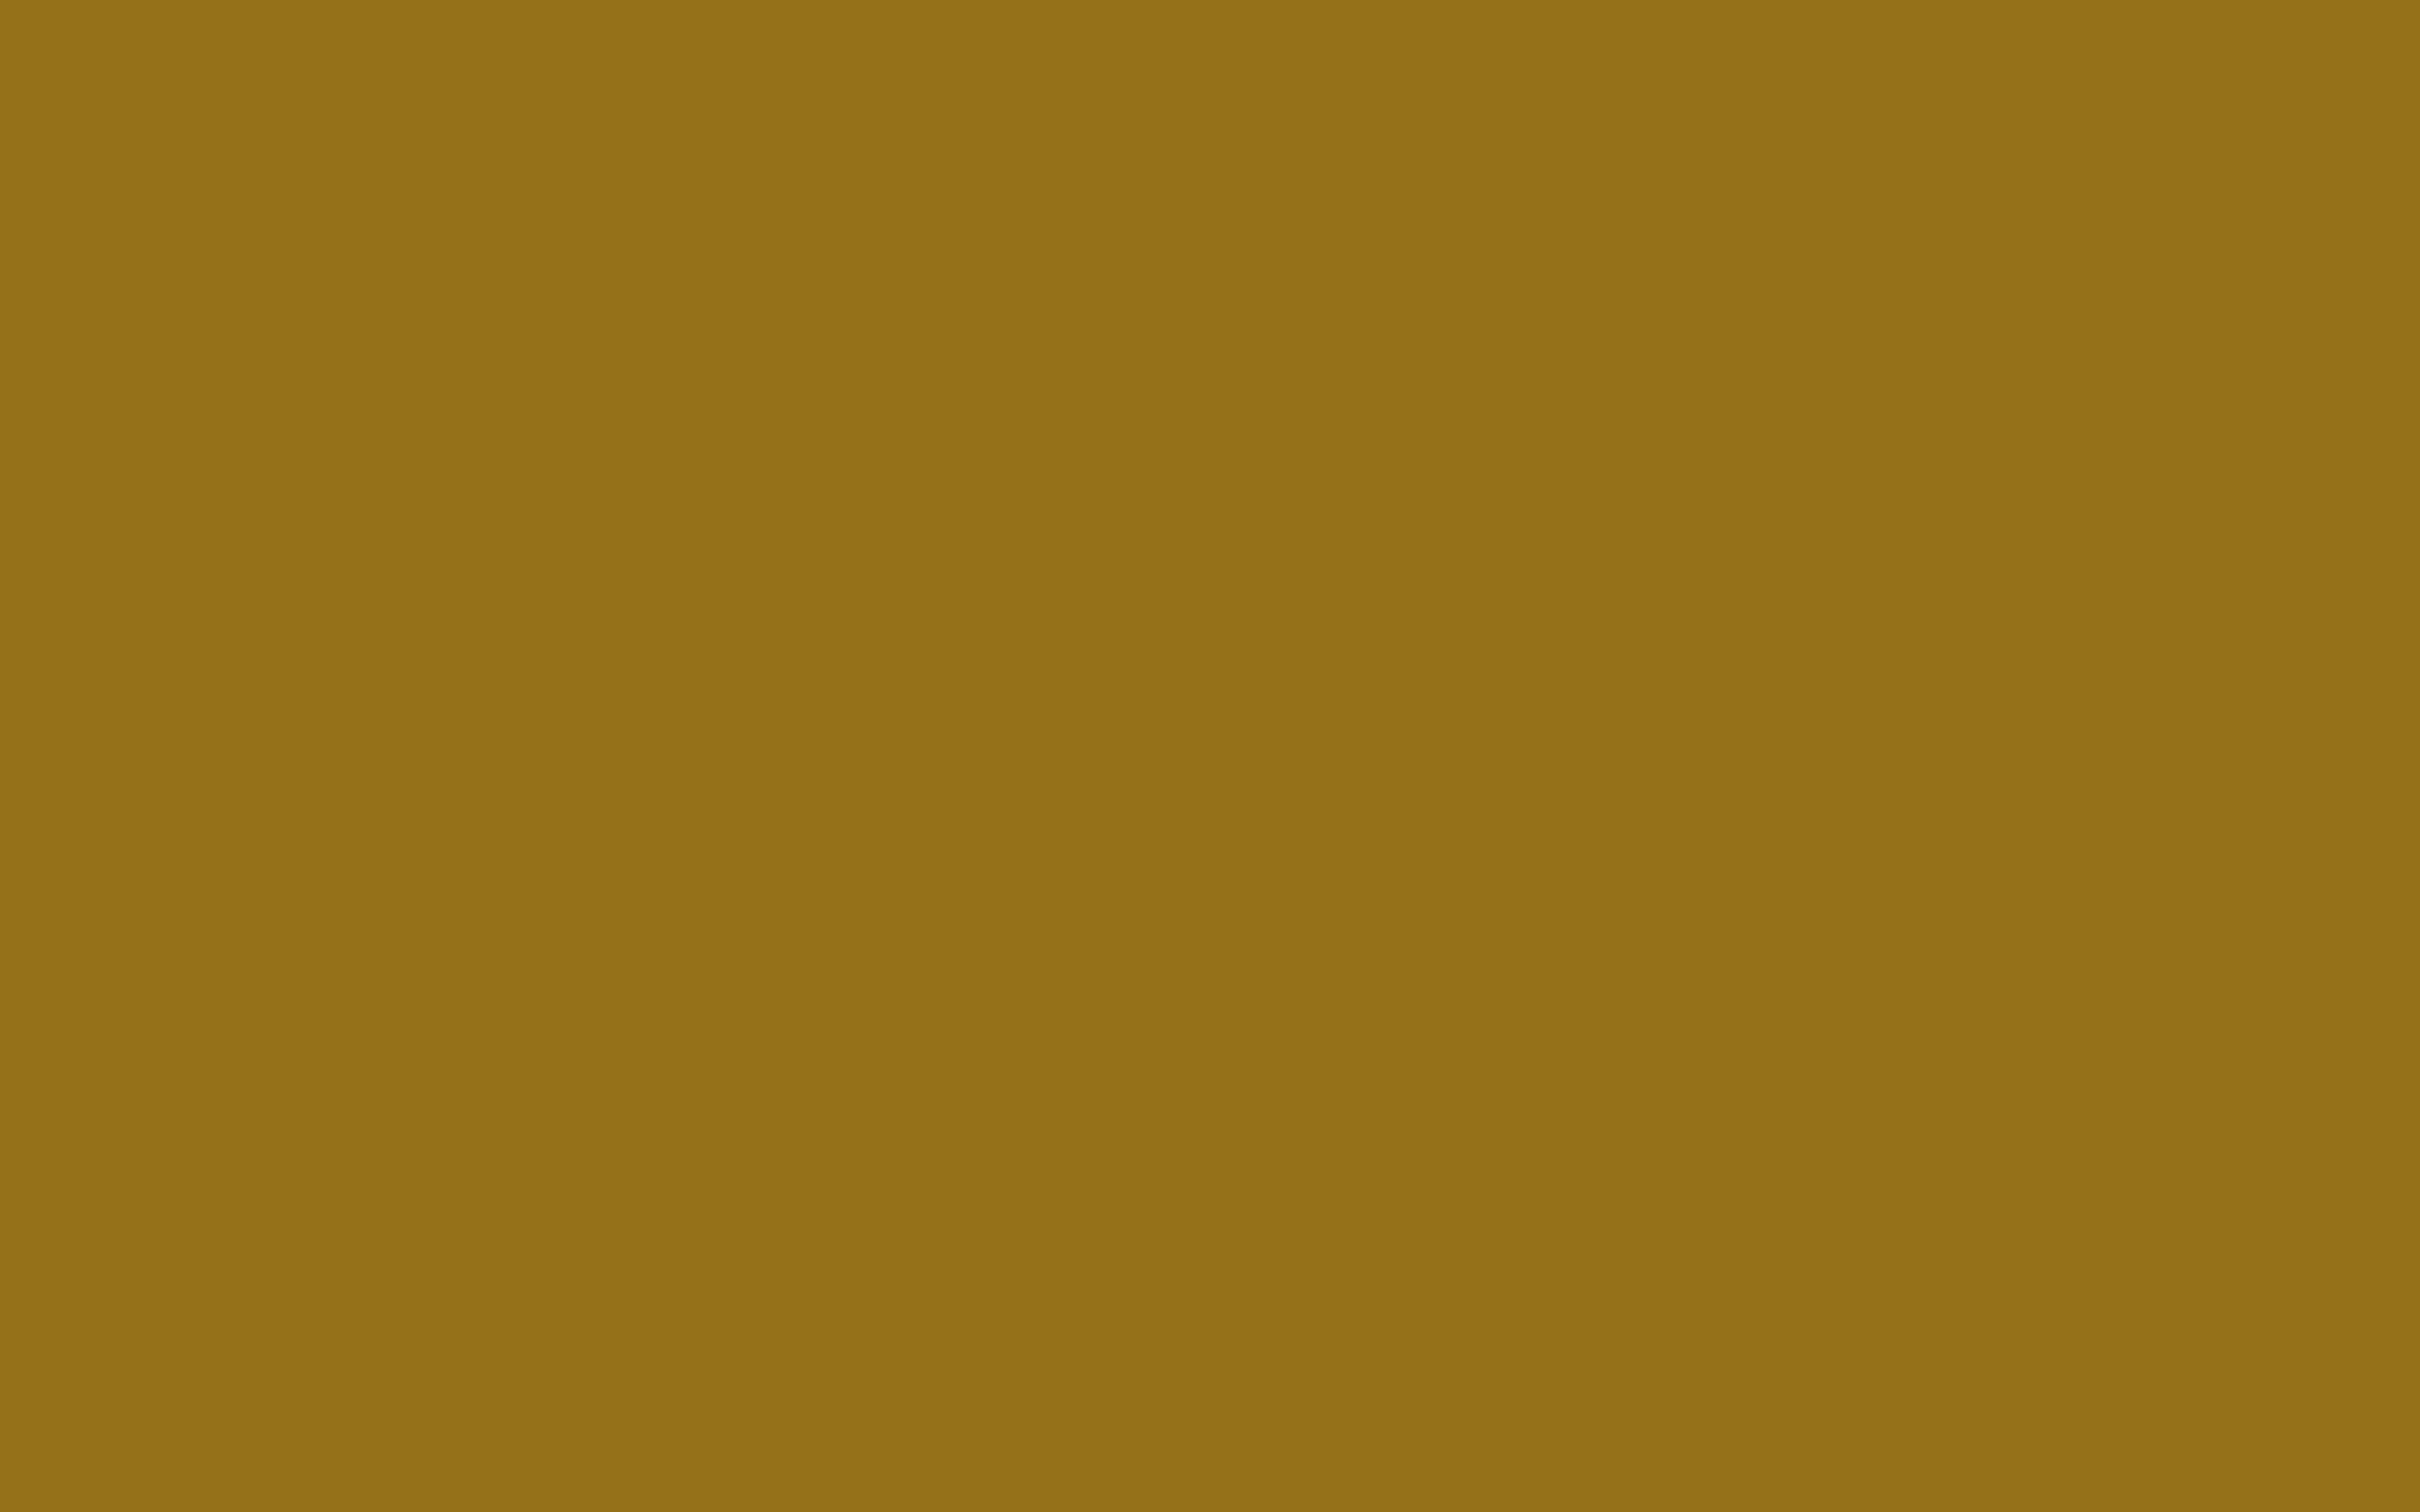 2560x1600 Mode Beige Solid Color Background